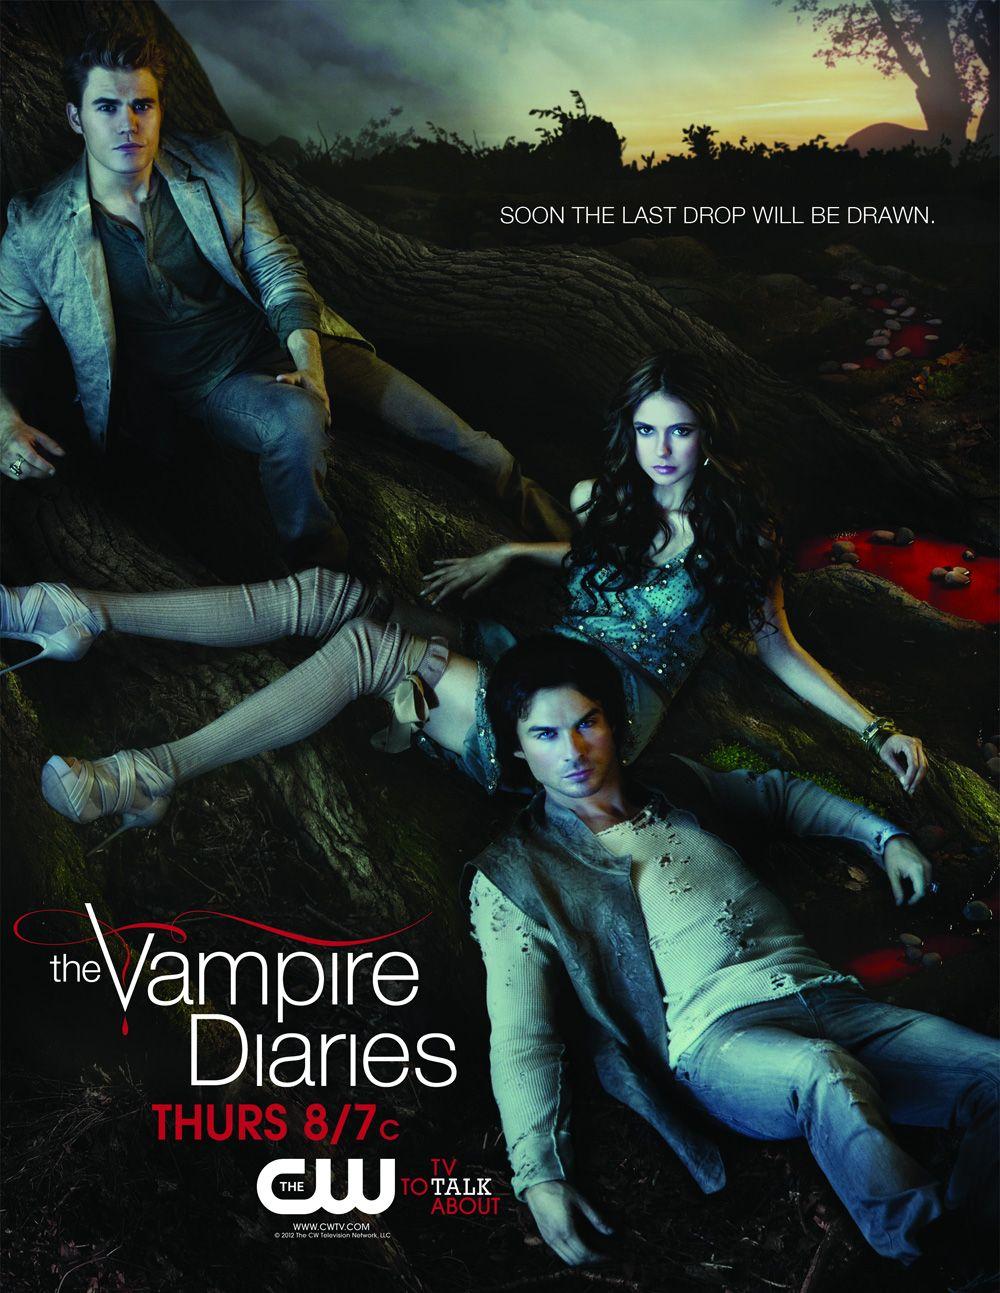 The Vampire Diaries S01-06 DVD | S06E10 HDTV |720O Thevampirediariess3post